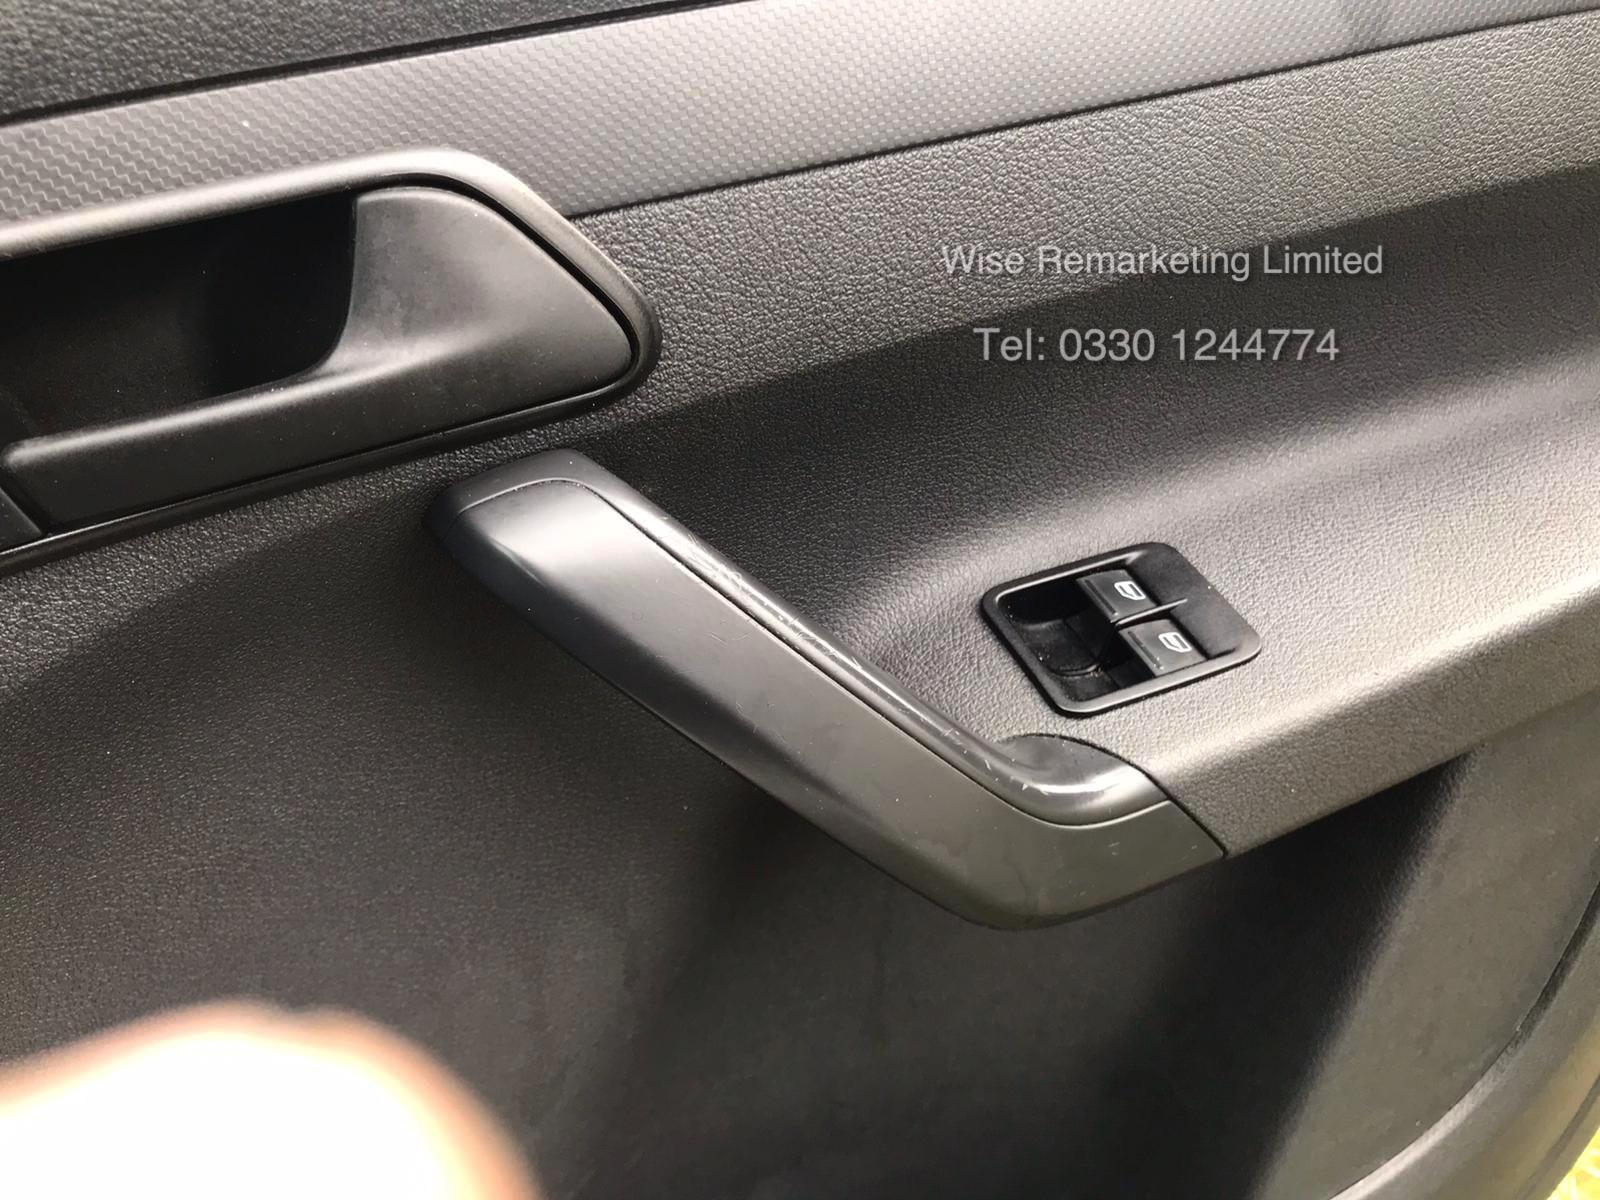 Volkswagen Caddy C20 + Startline 1.6 Tdi - 2014 Model - White - Side Loading Door - Ply Lined - Image 10 of 13